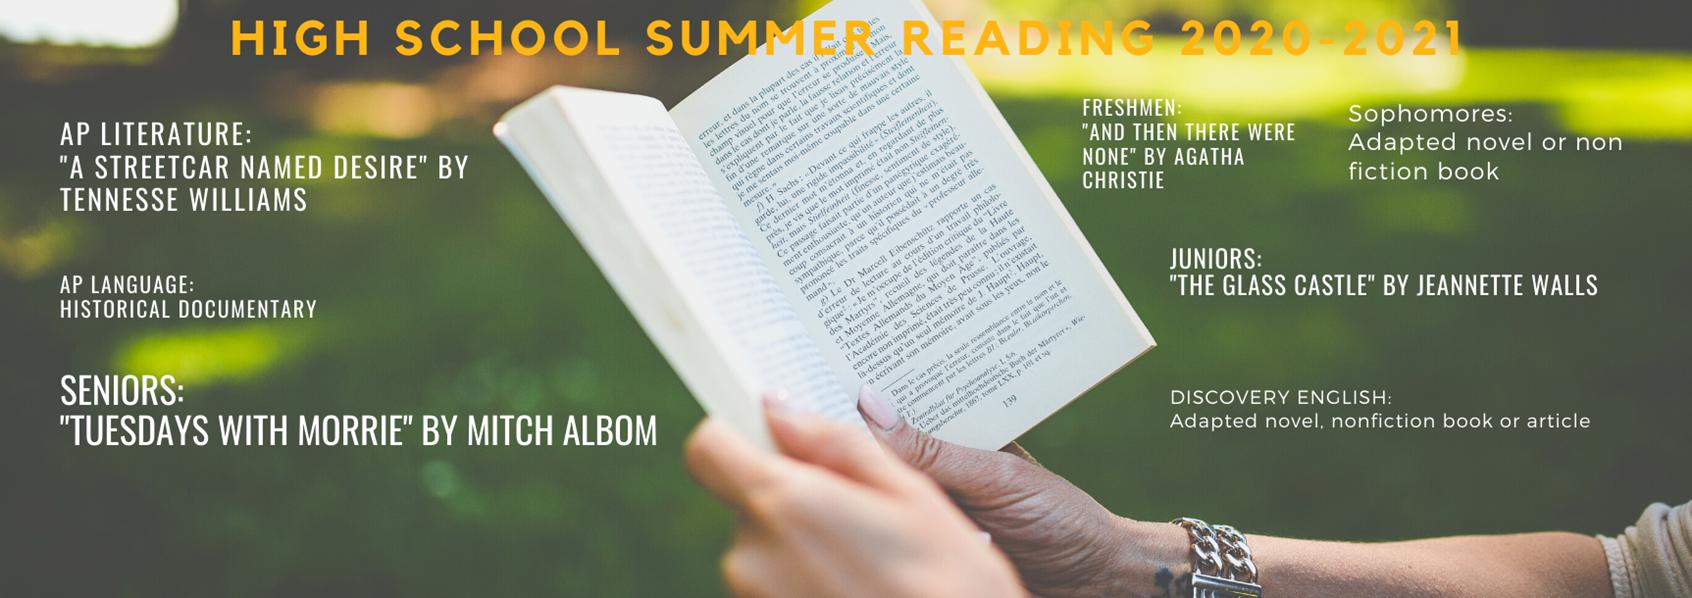 DLHS Summer Reading 2020-21